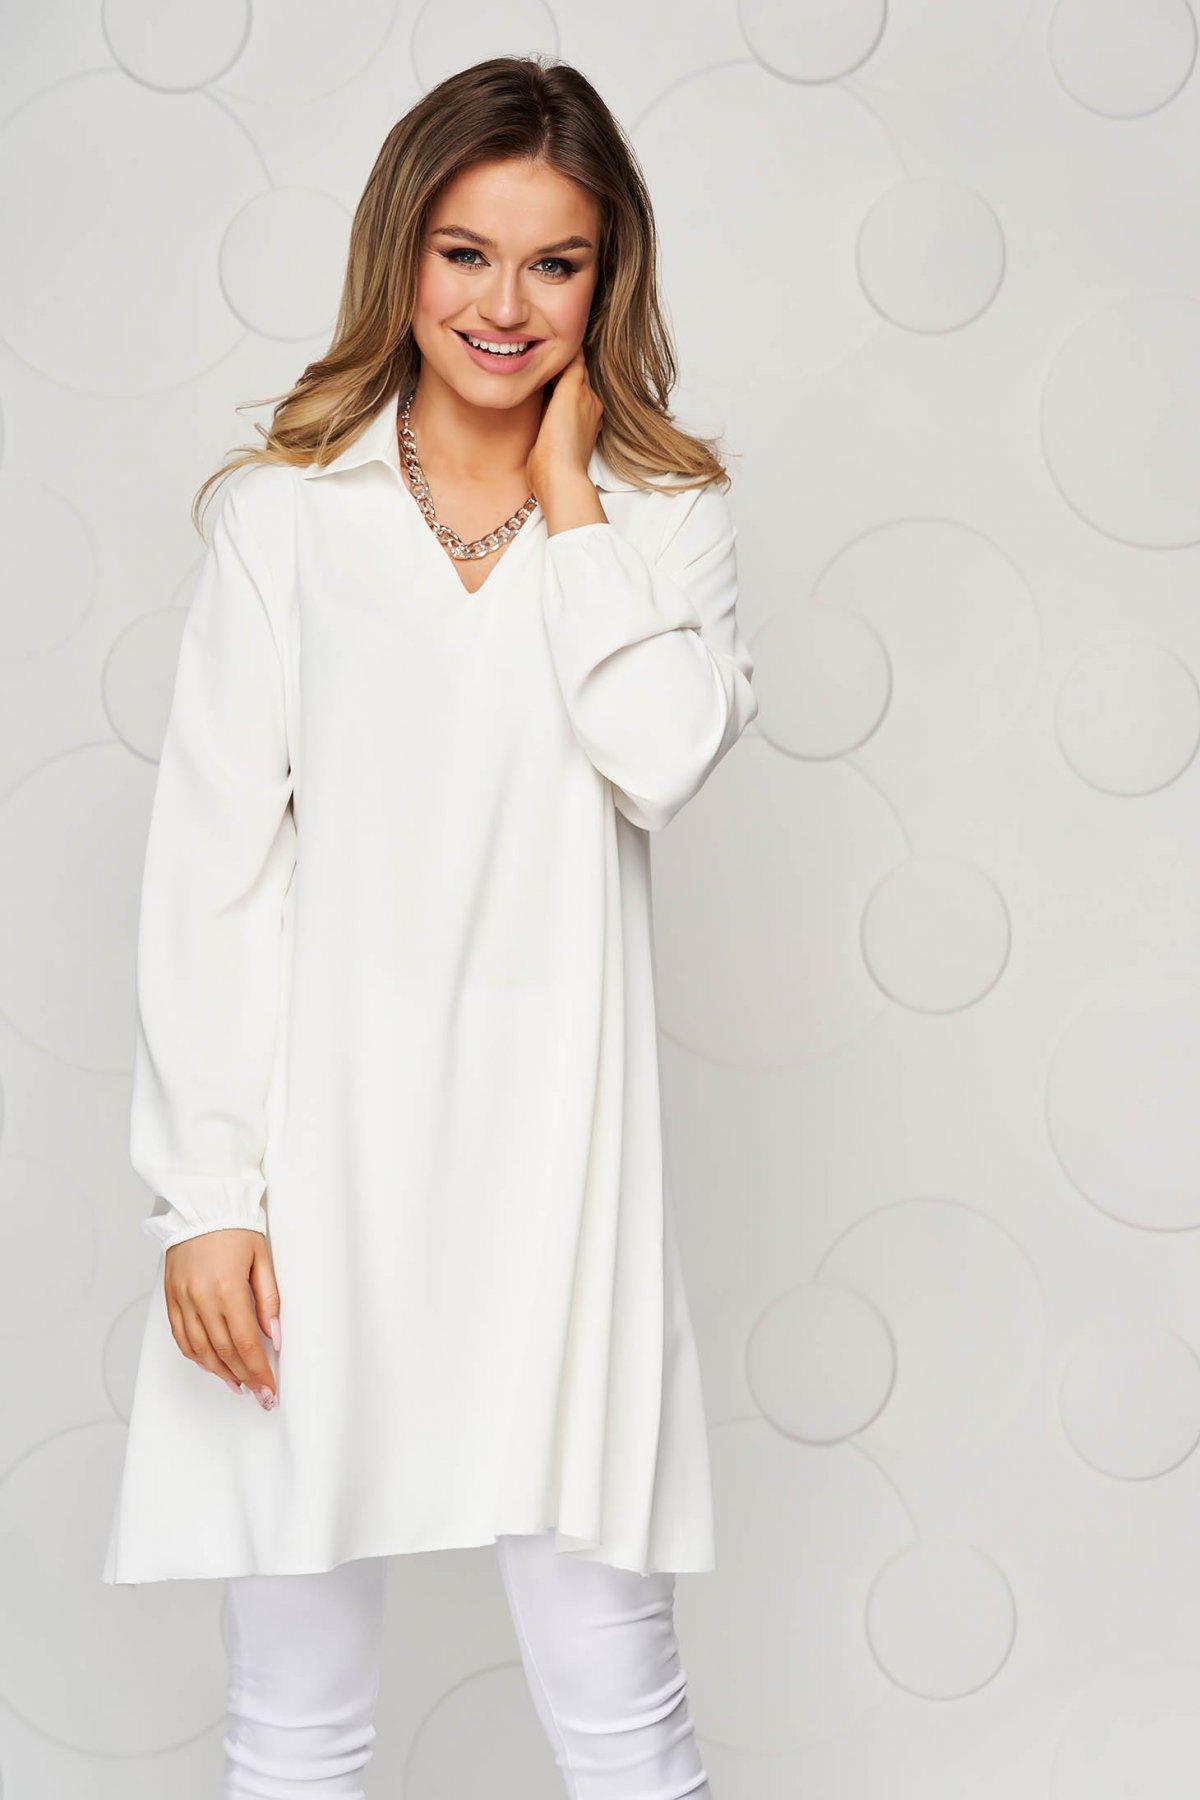 Bluza dama SunShine alba cu croi larg din material vaporos si transparent cu maneca lunga